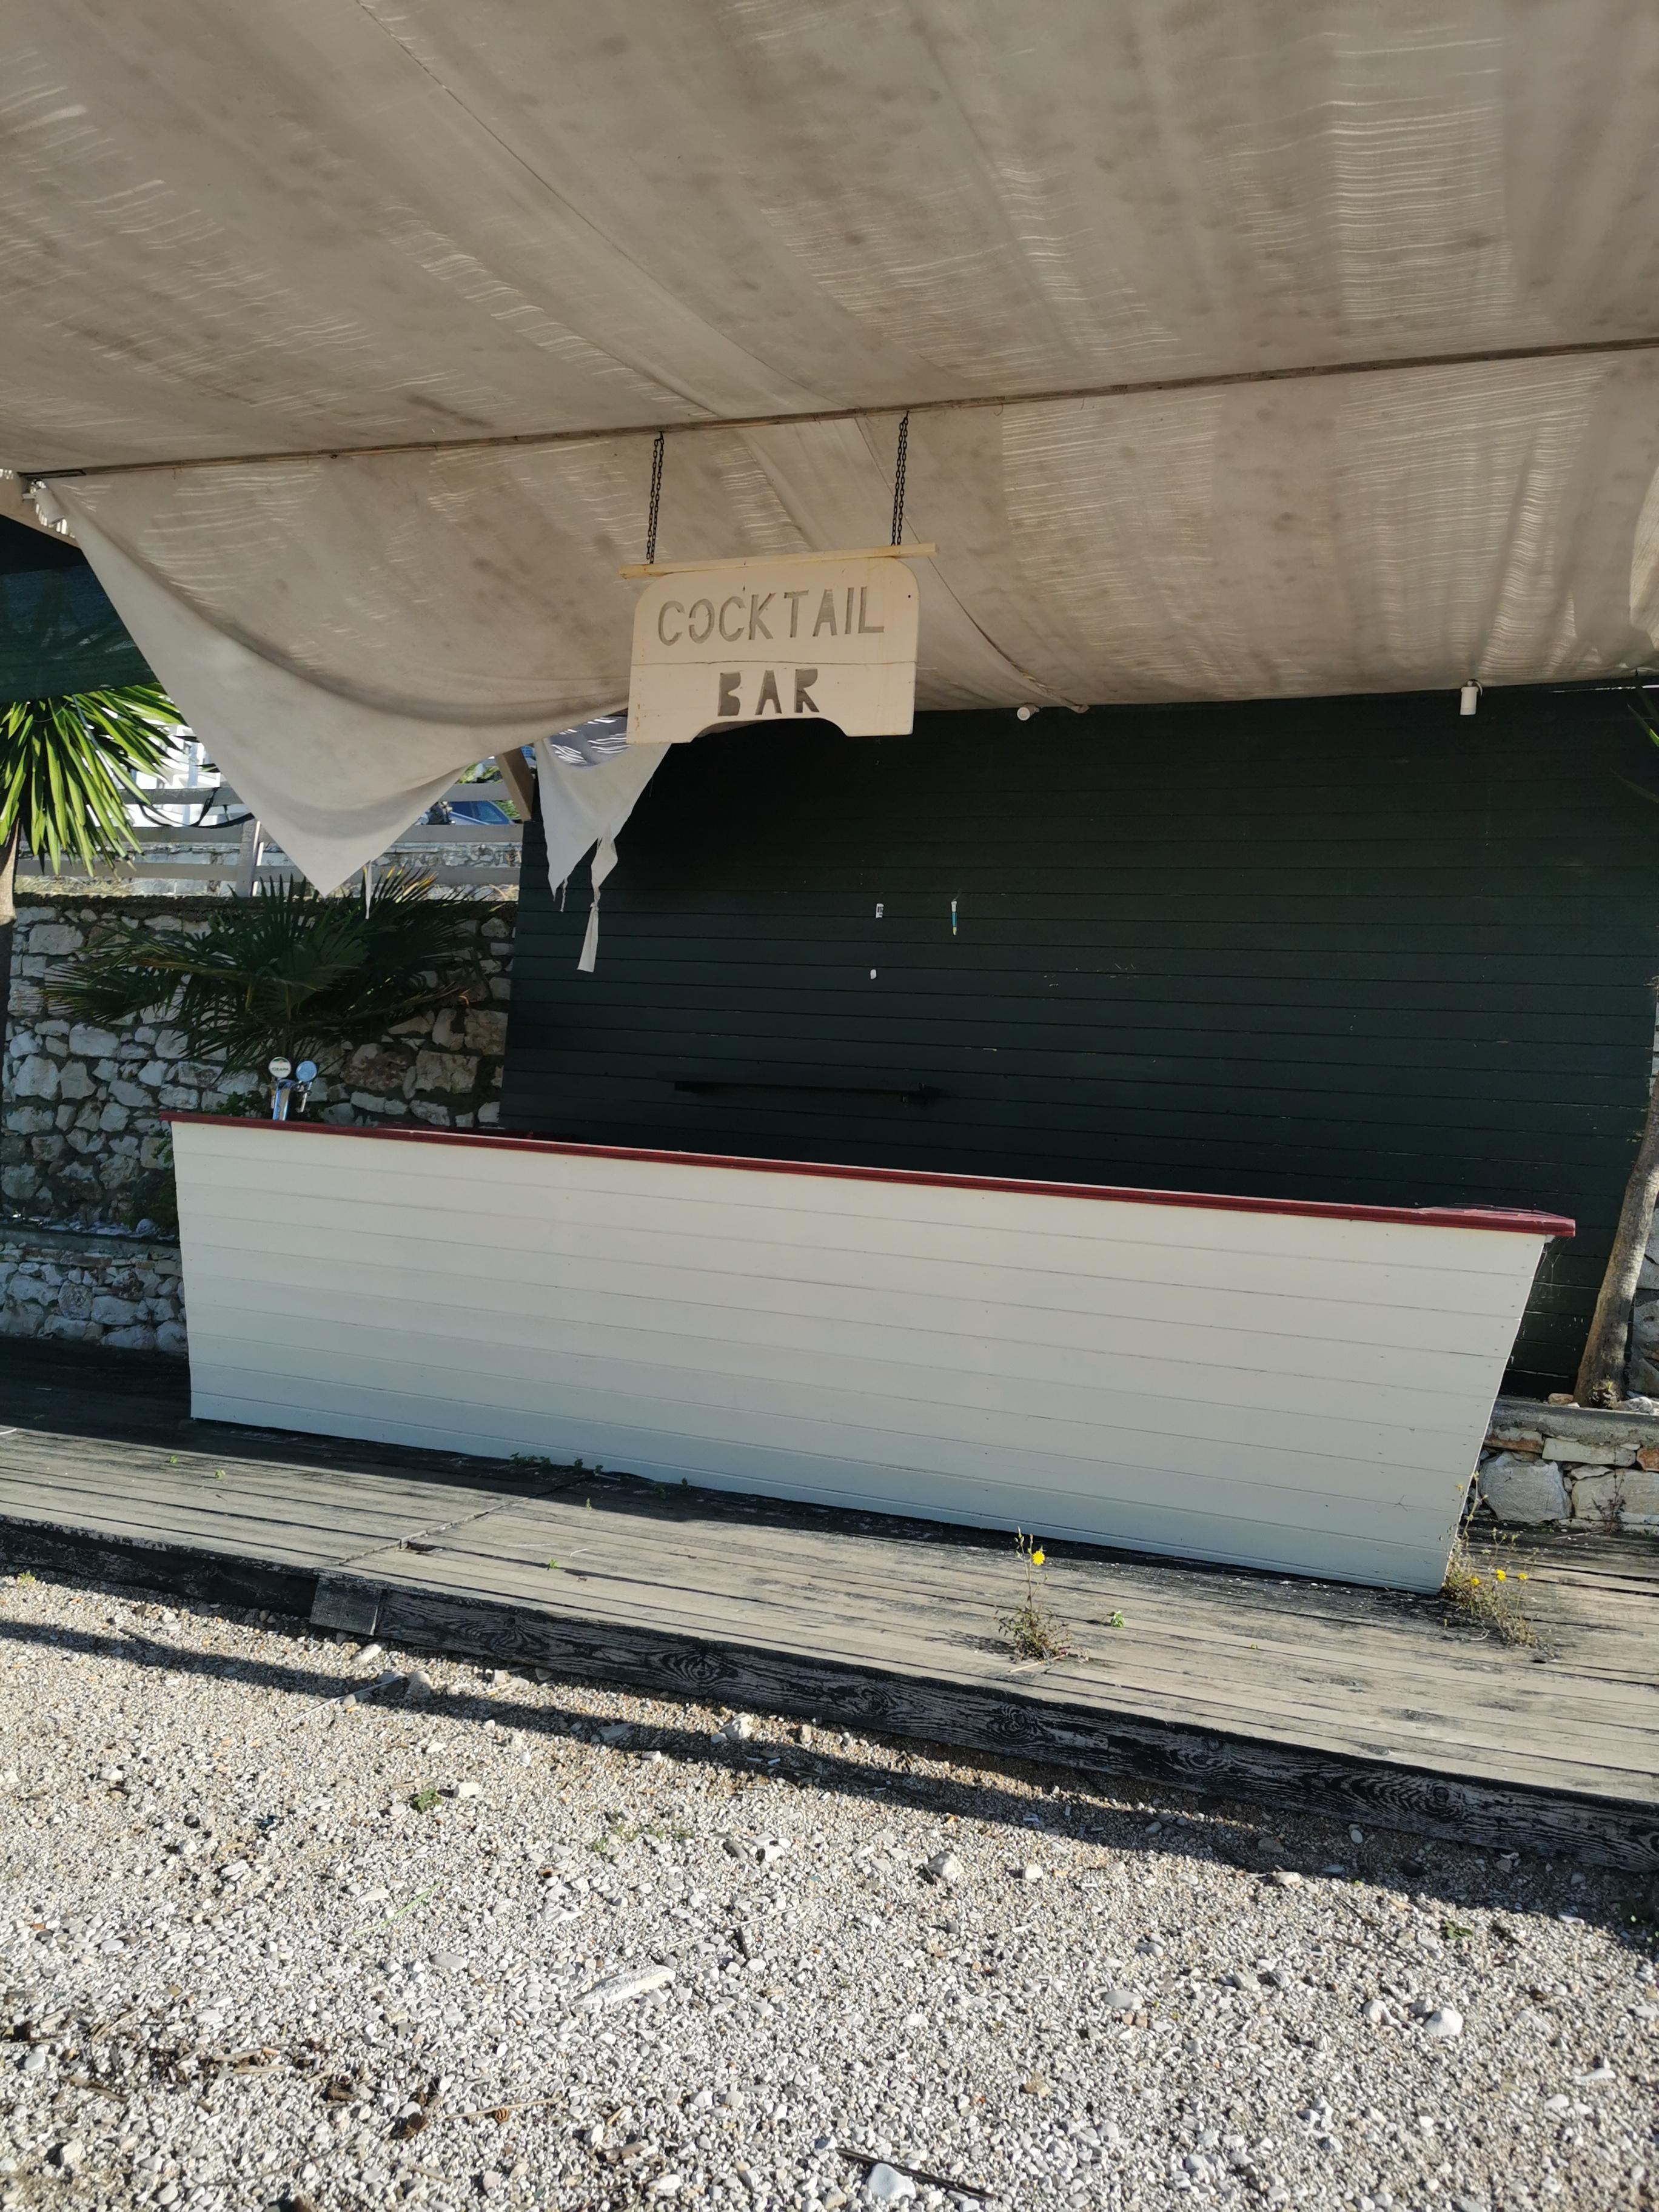 Letovanje Albanija hoteli, Saranda, autobus, Hotel Perla, coctail bar